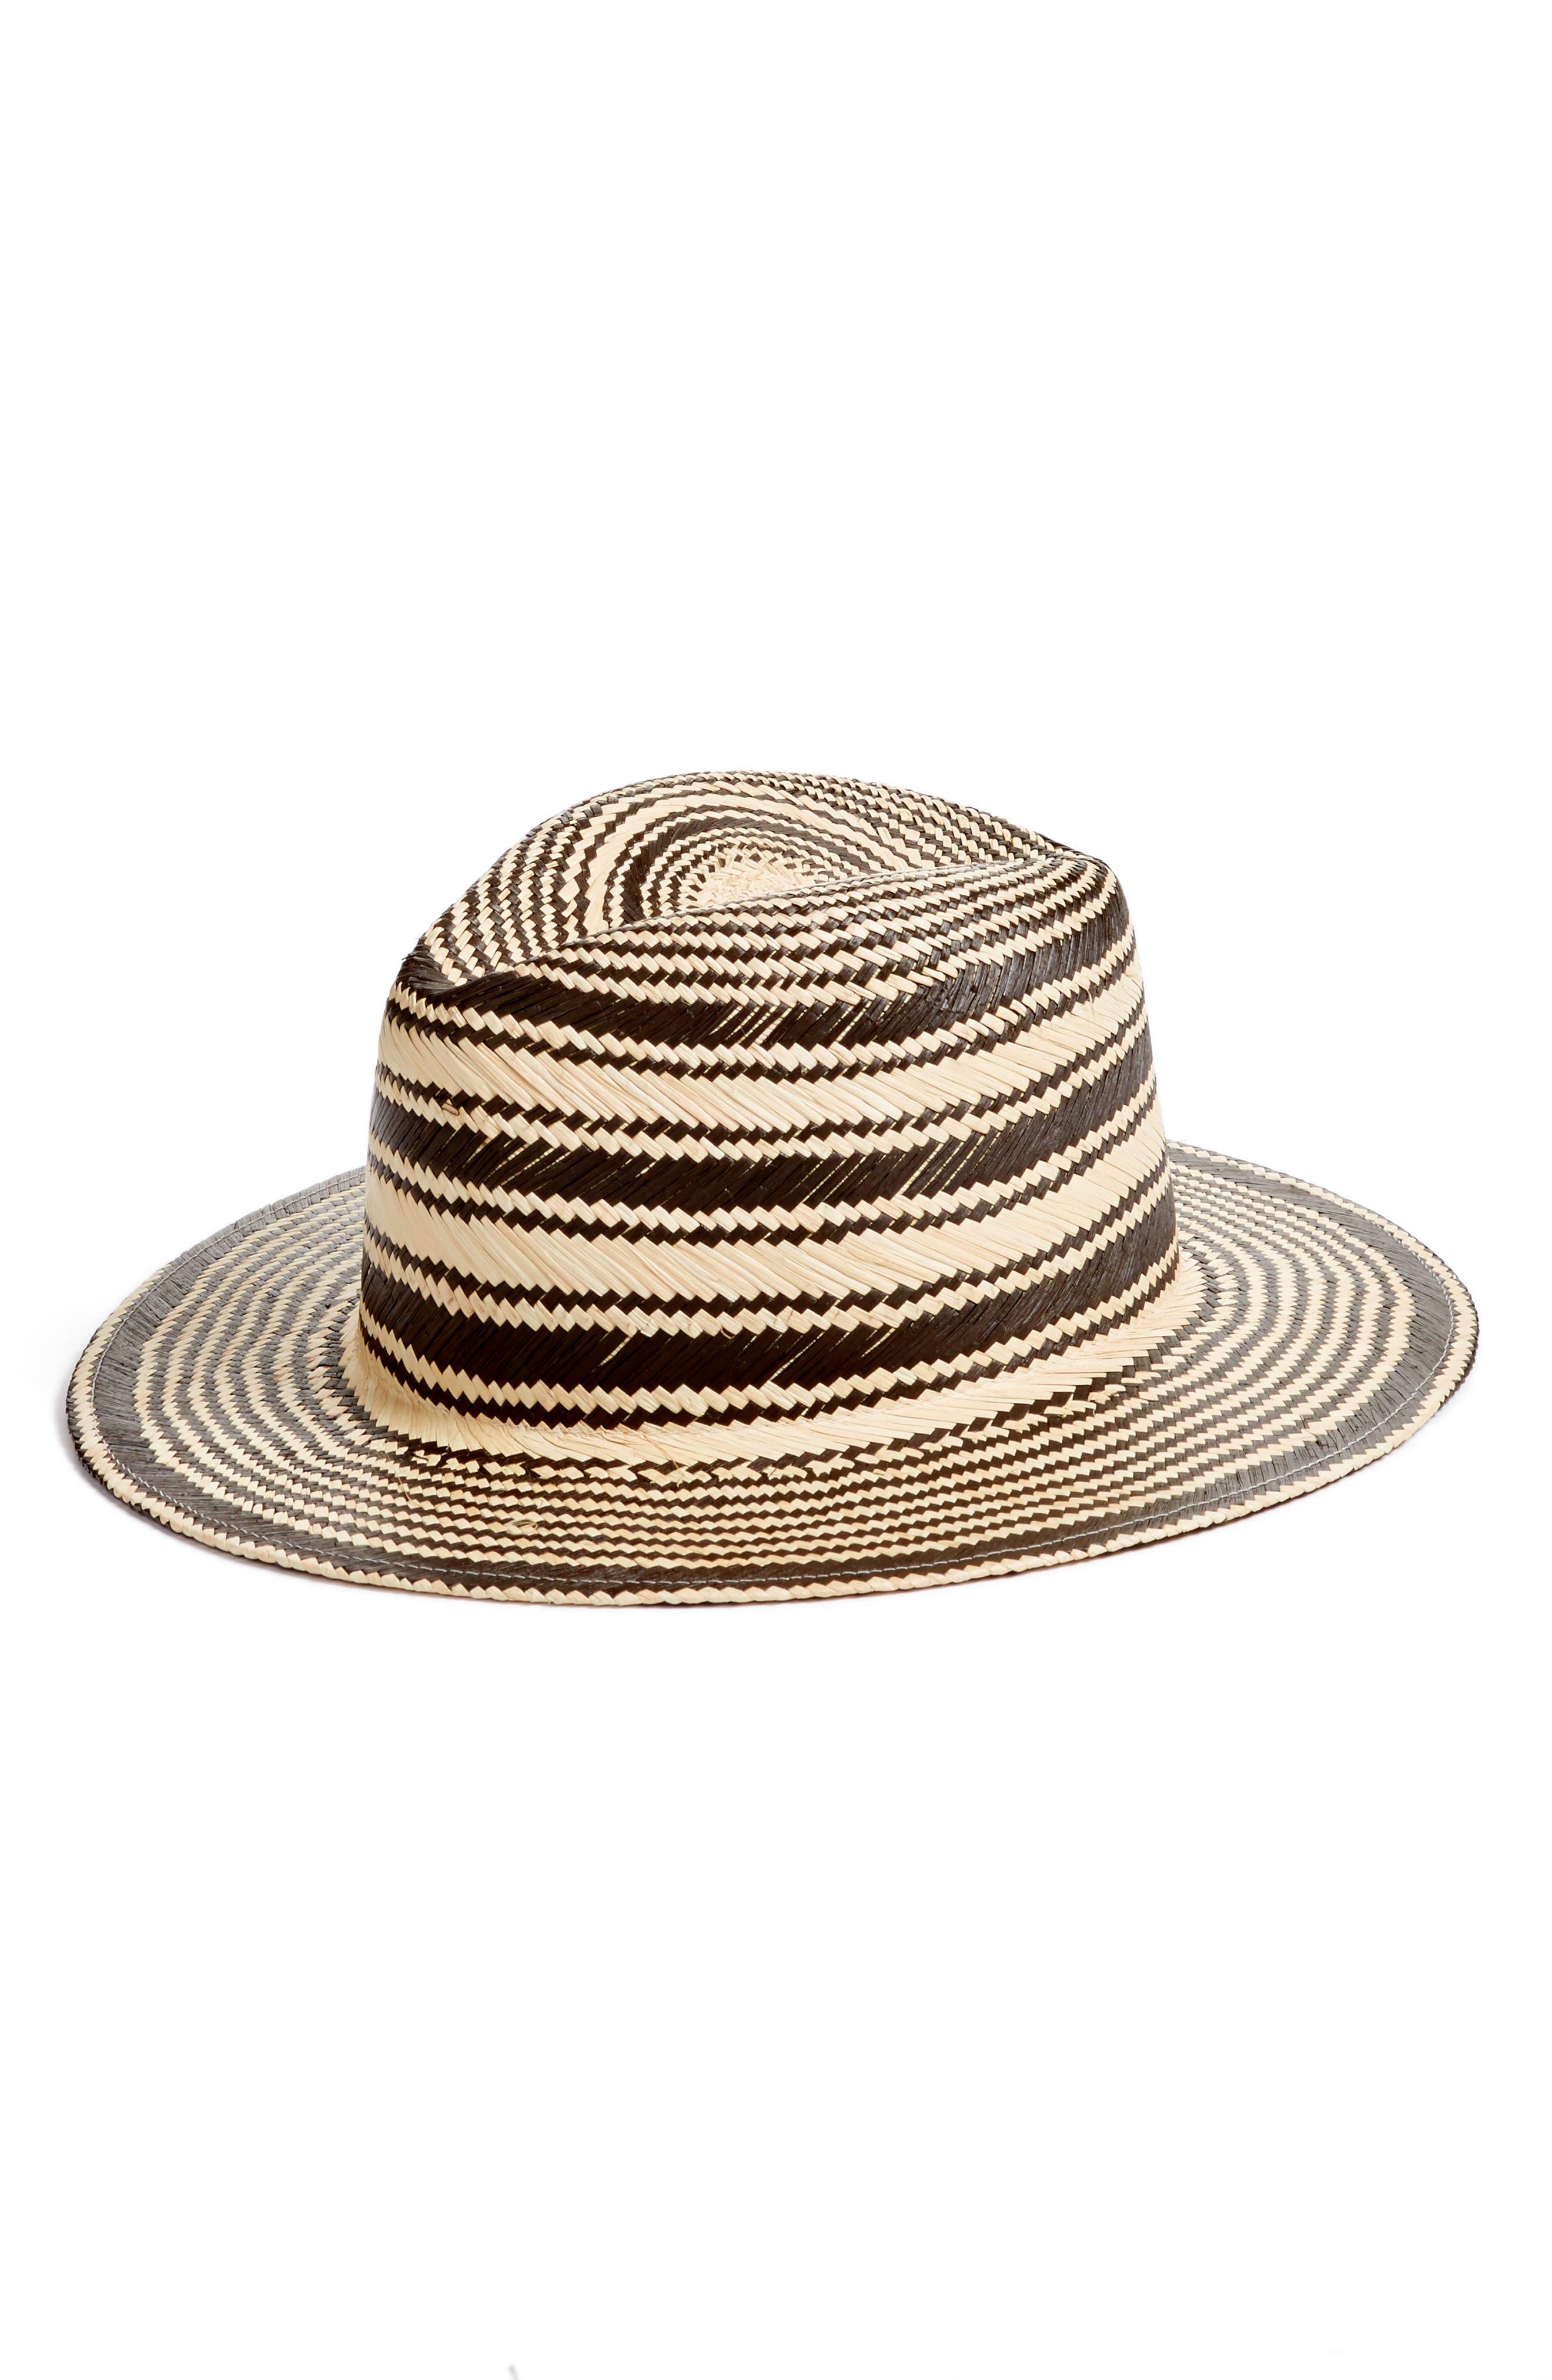 Stripe Panama Hat,                             Main thumbnail 1, color,                             001